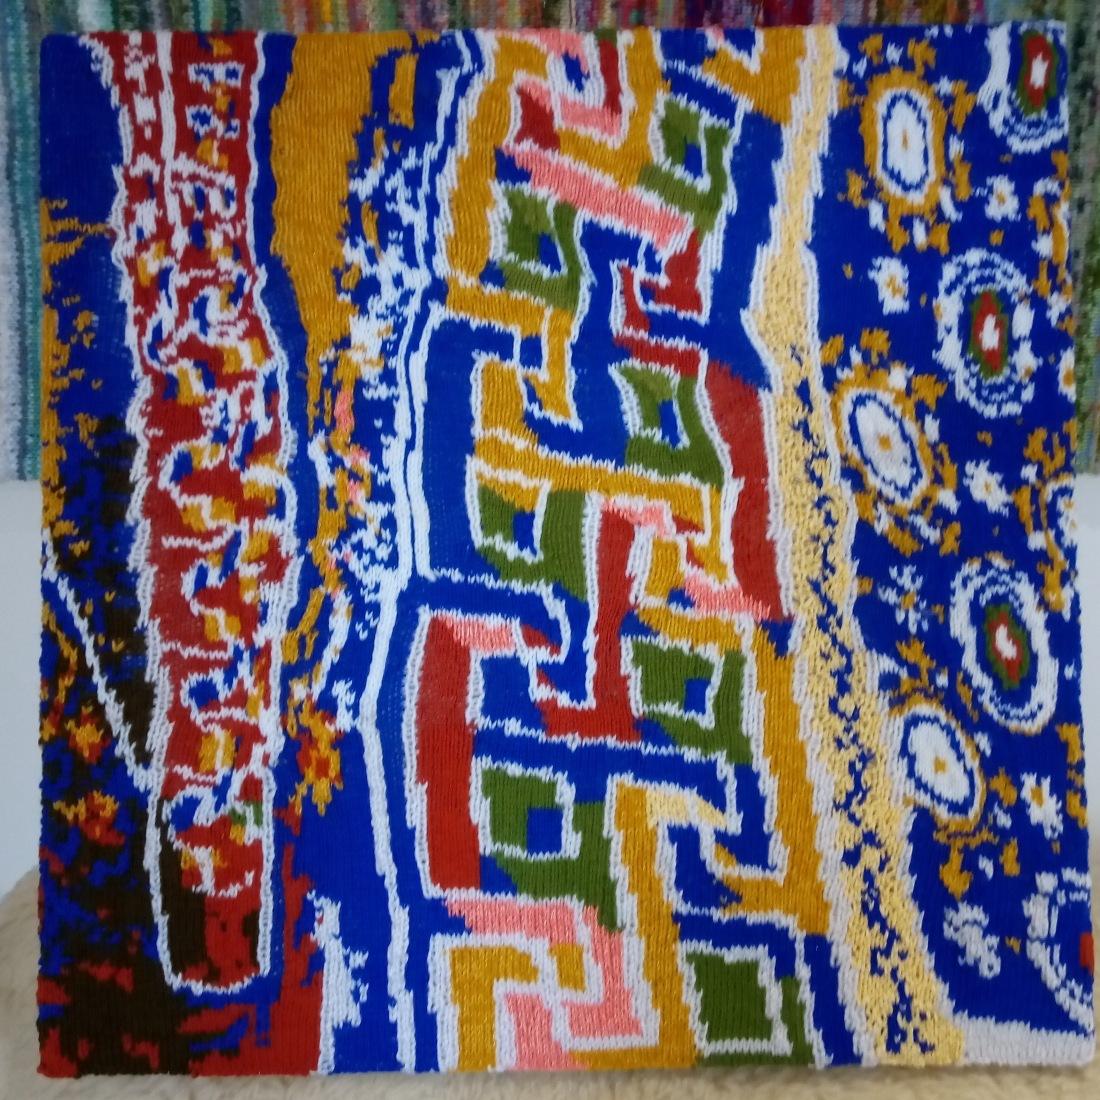 221 2019 Ravenna mosaics